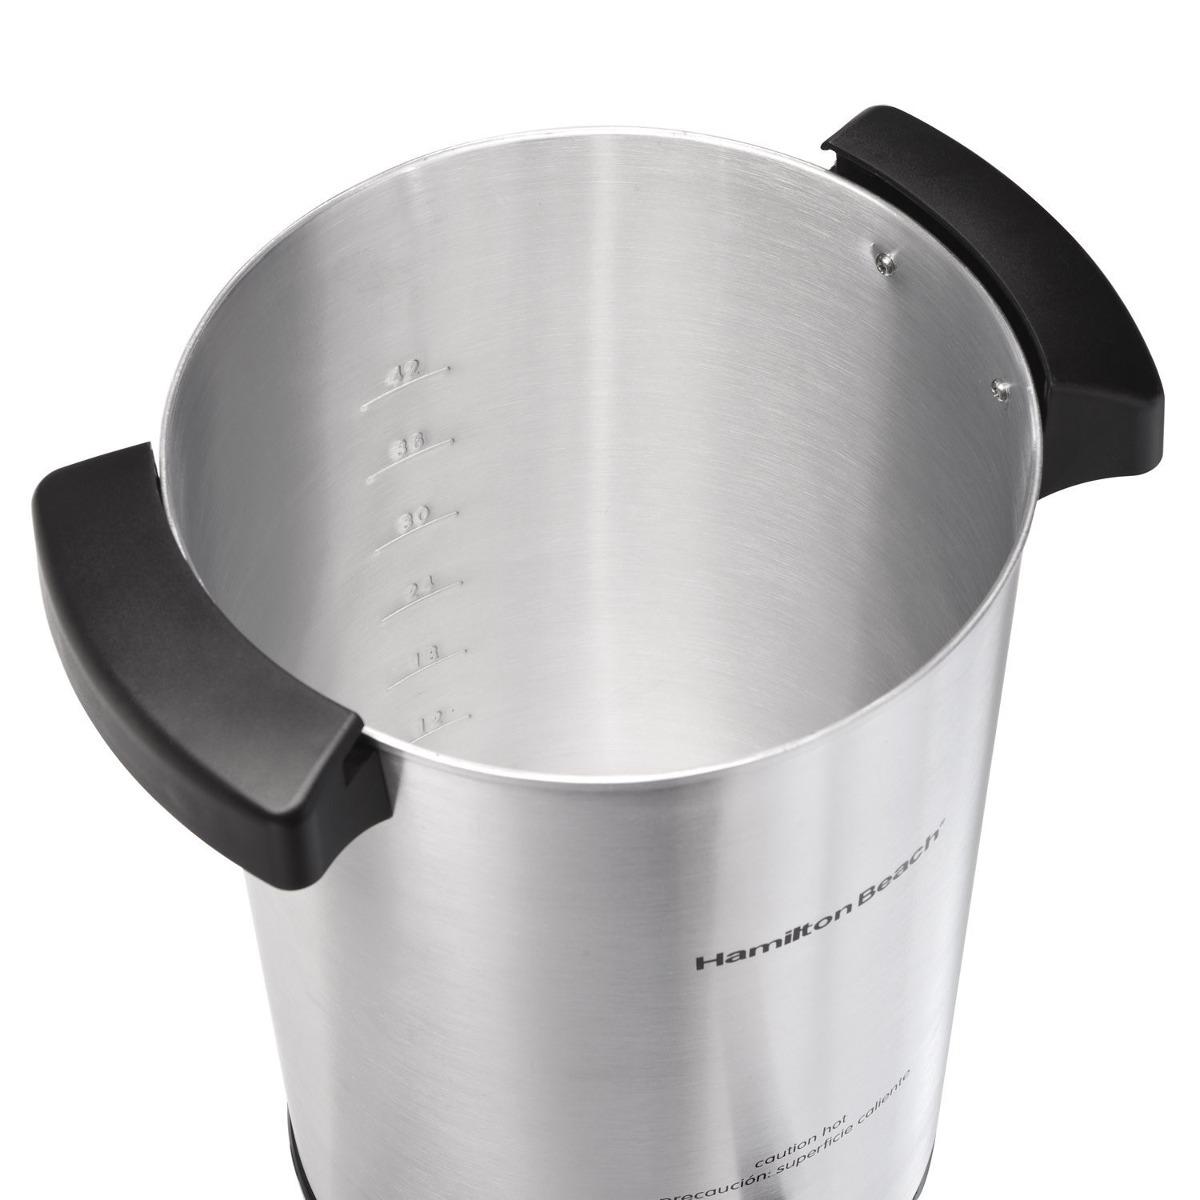 Cafetera Hamilton Beach 40515 42-cup Coffee Urn Silver